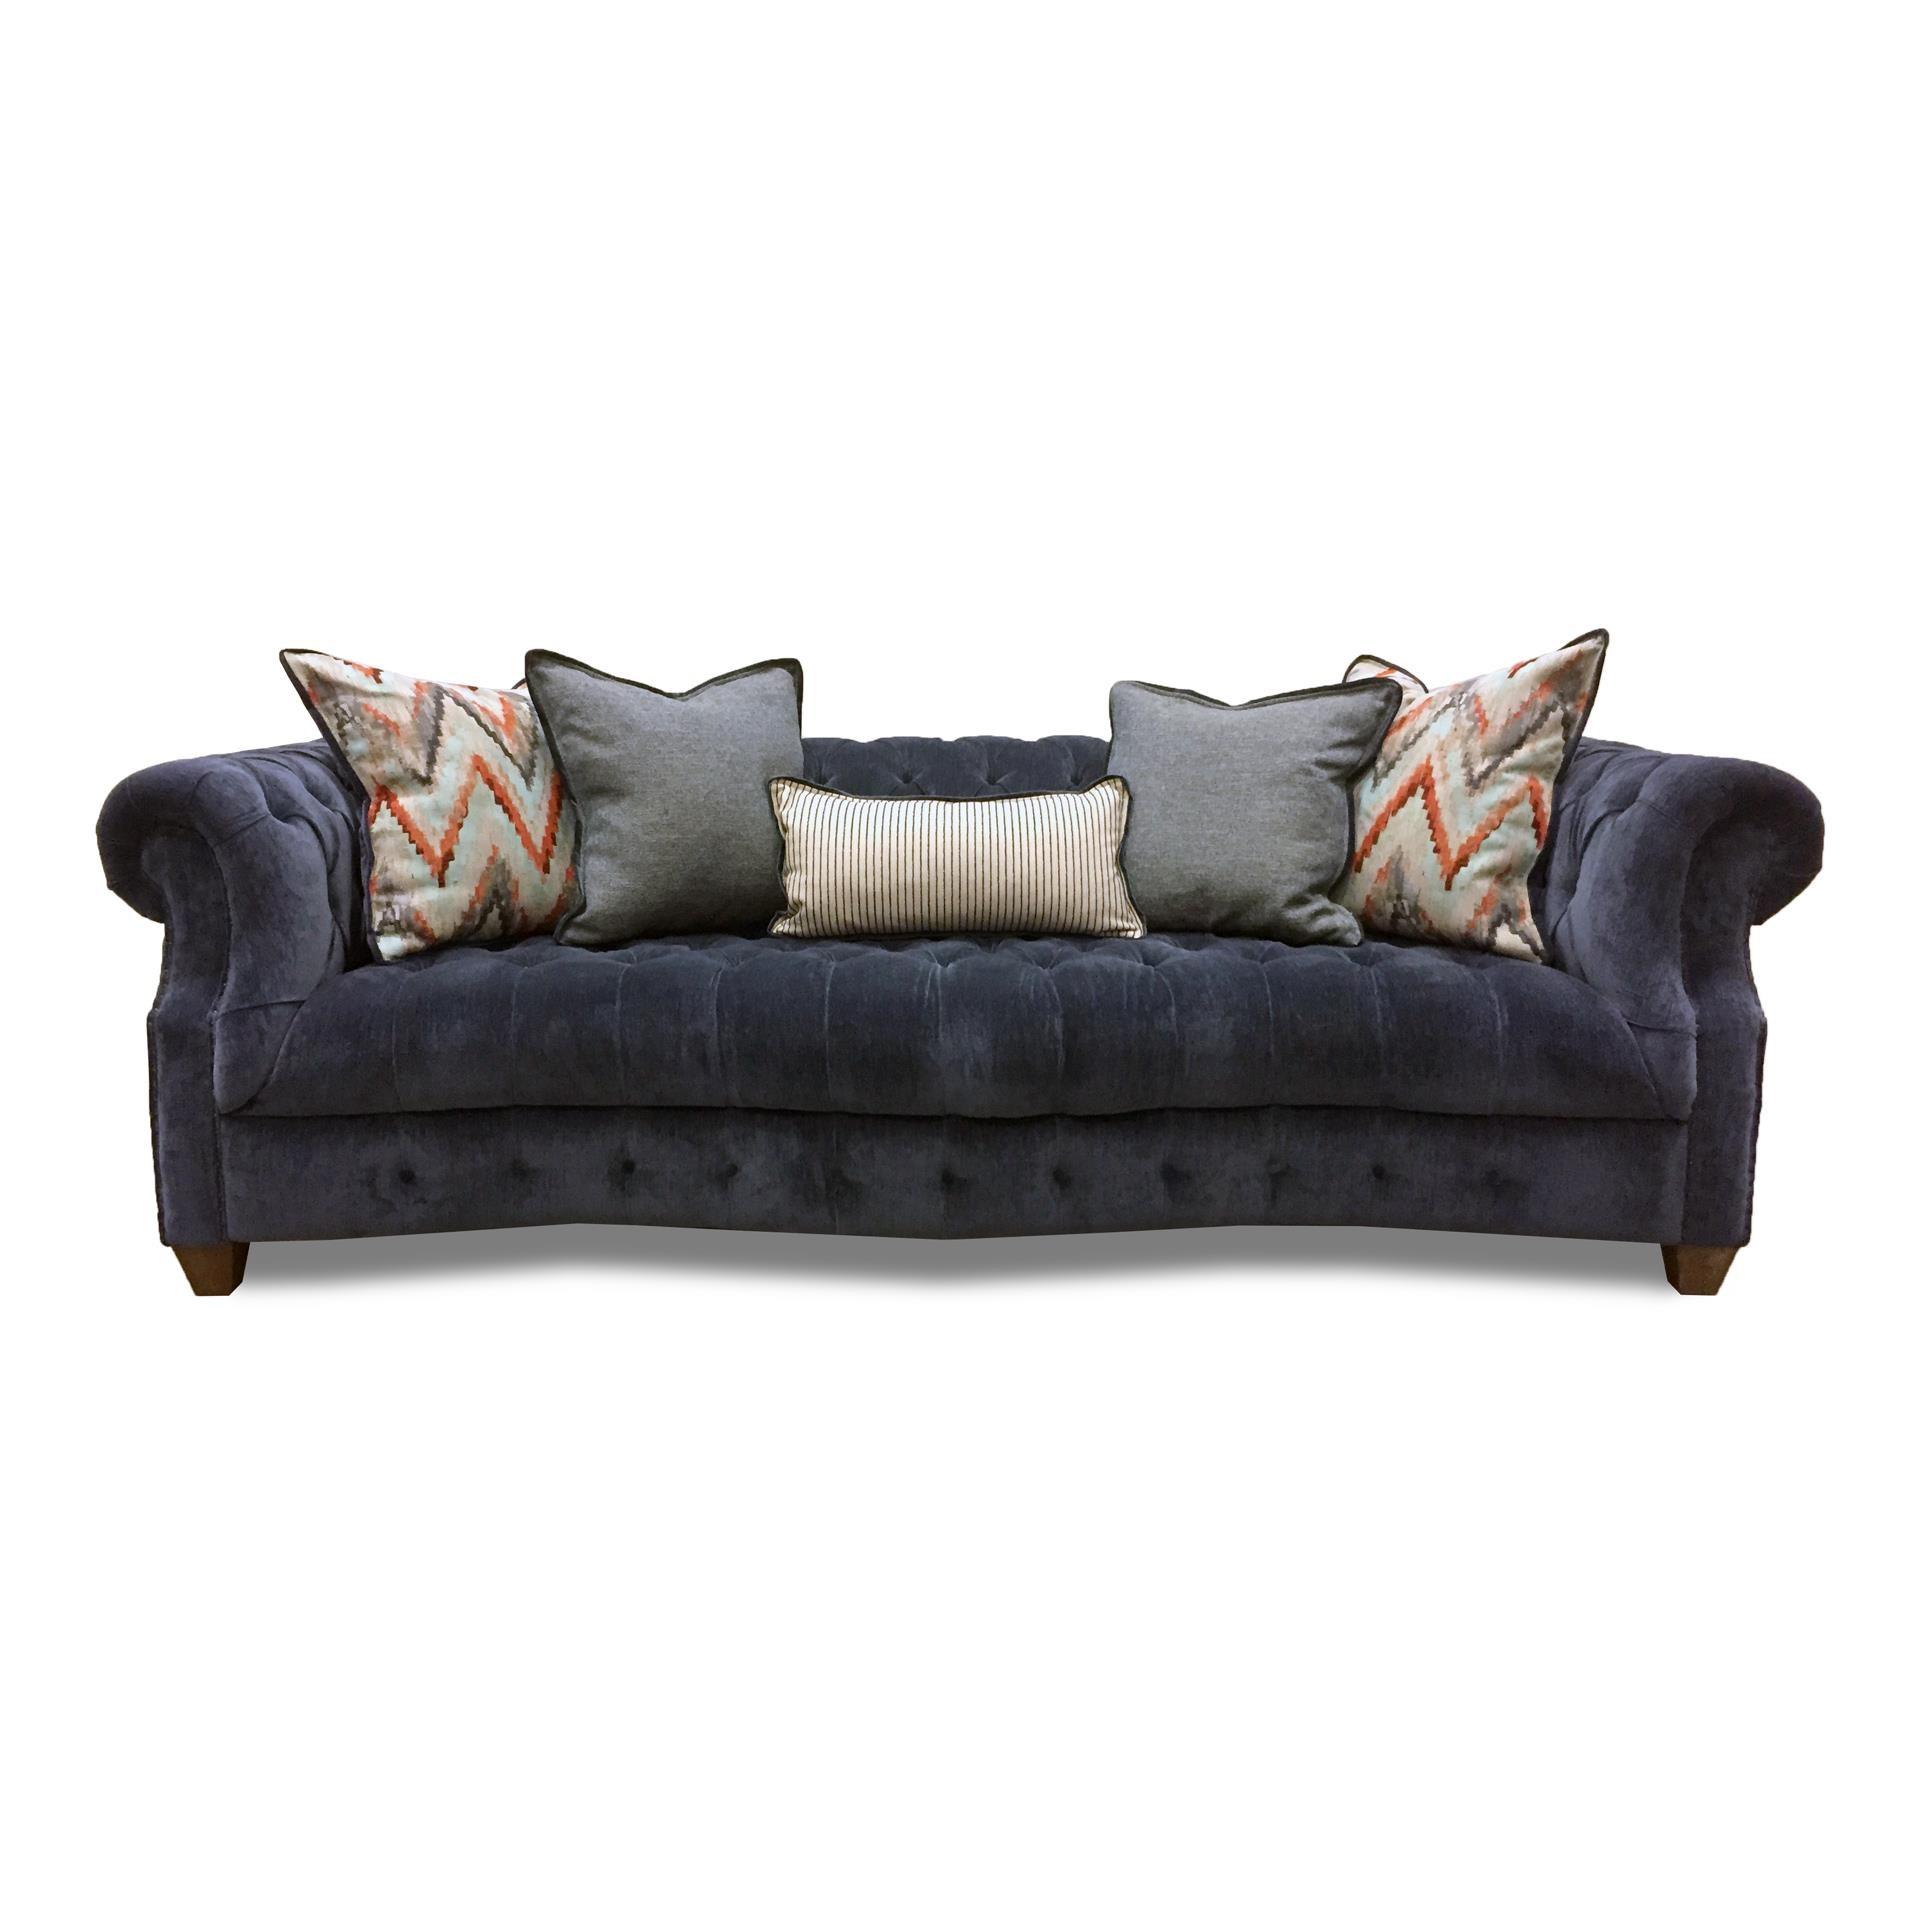 Aria Designs Kendall Blue Velvet Sofa - Item Number: 45-A133S-0-6121L-026